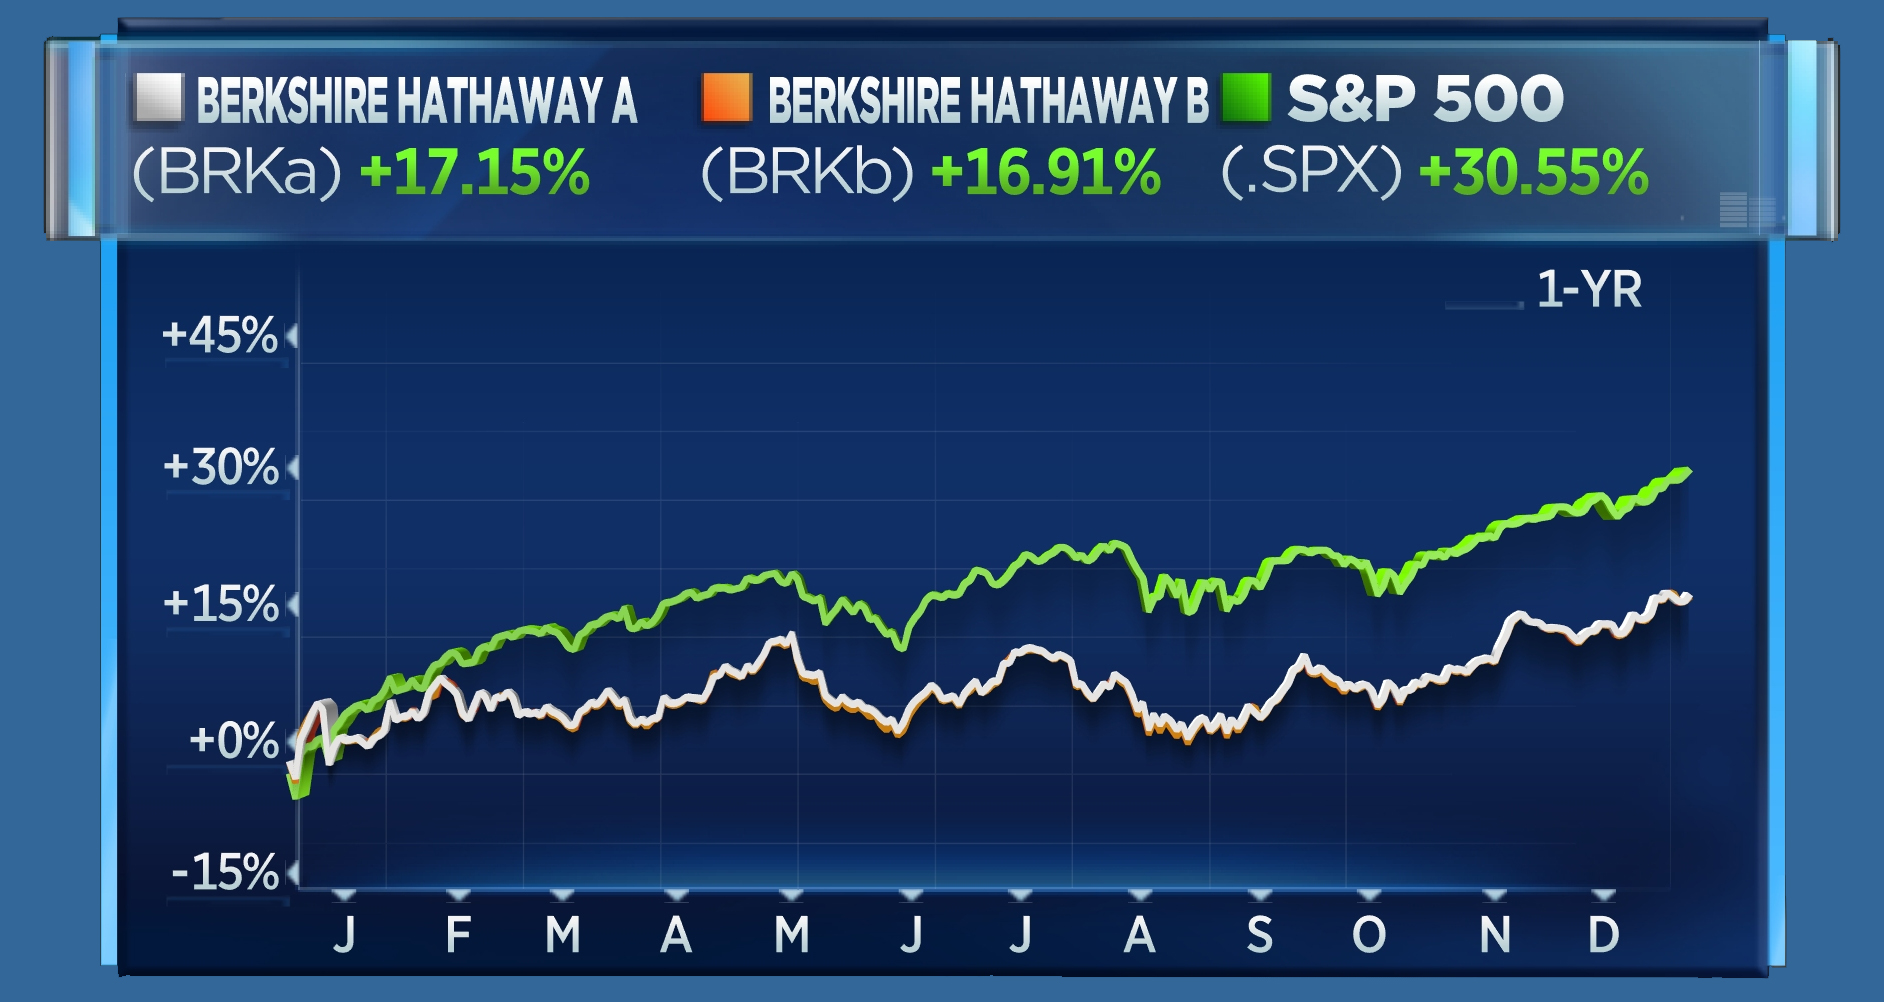 BRKA vs BRKB vs S&P